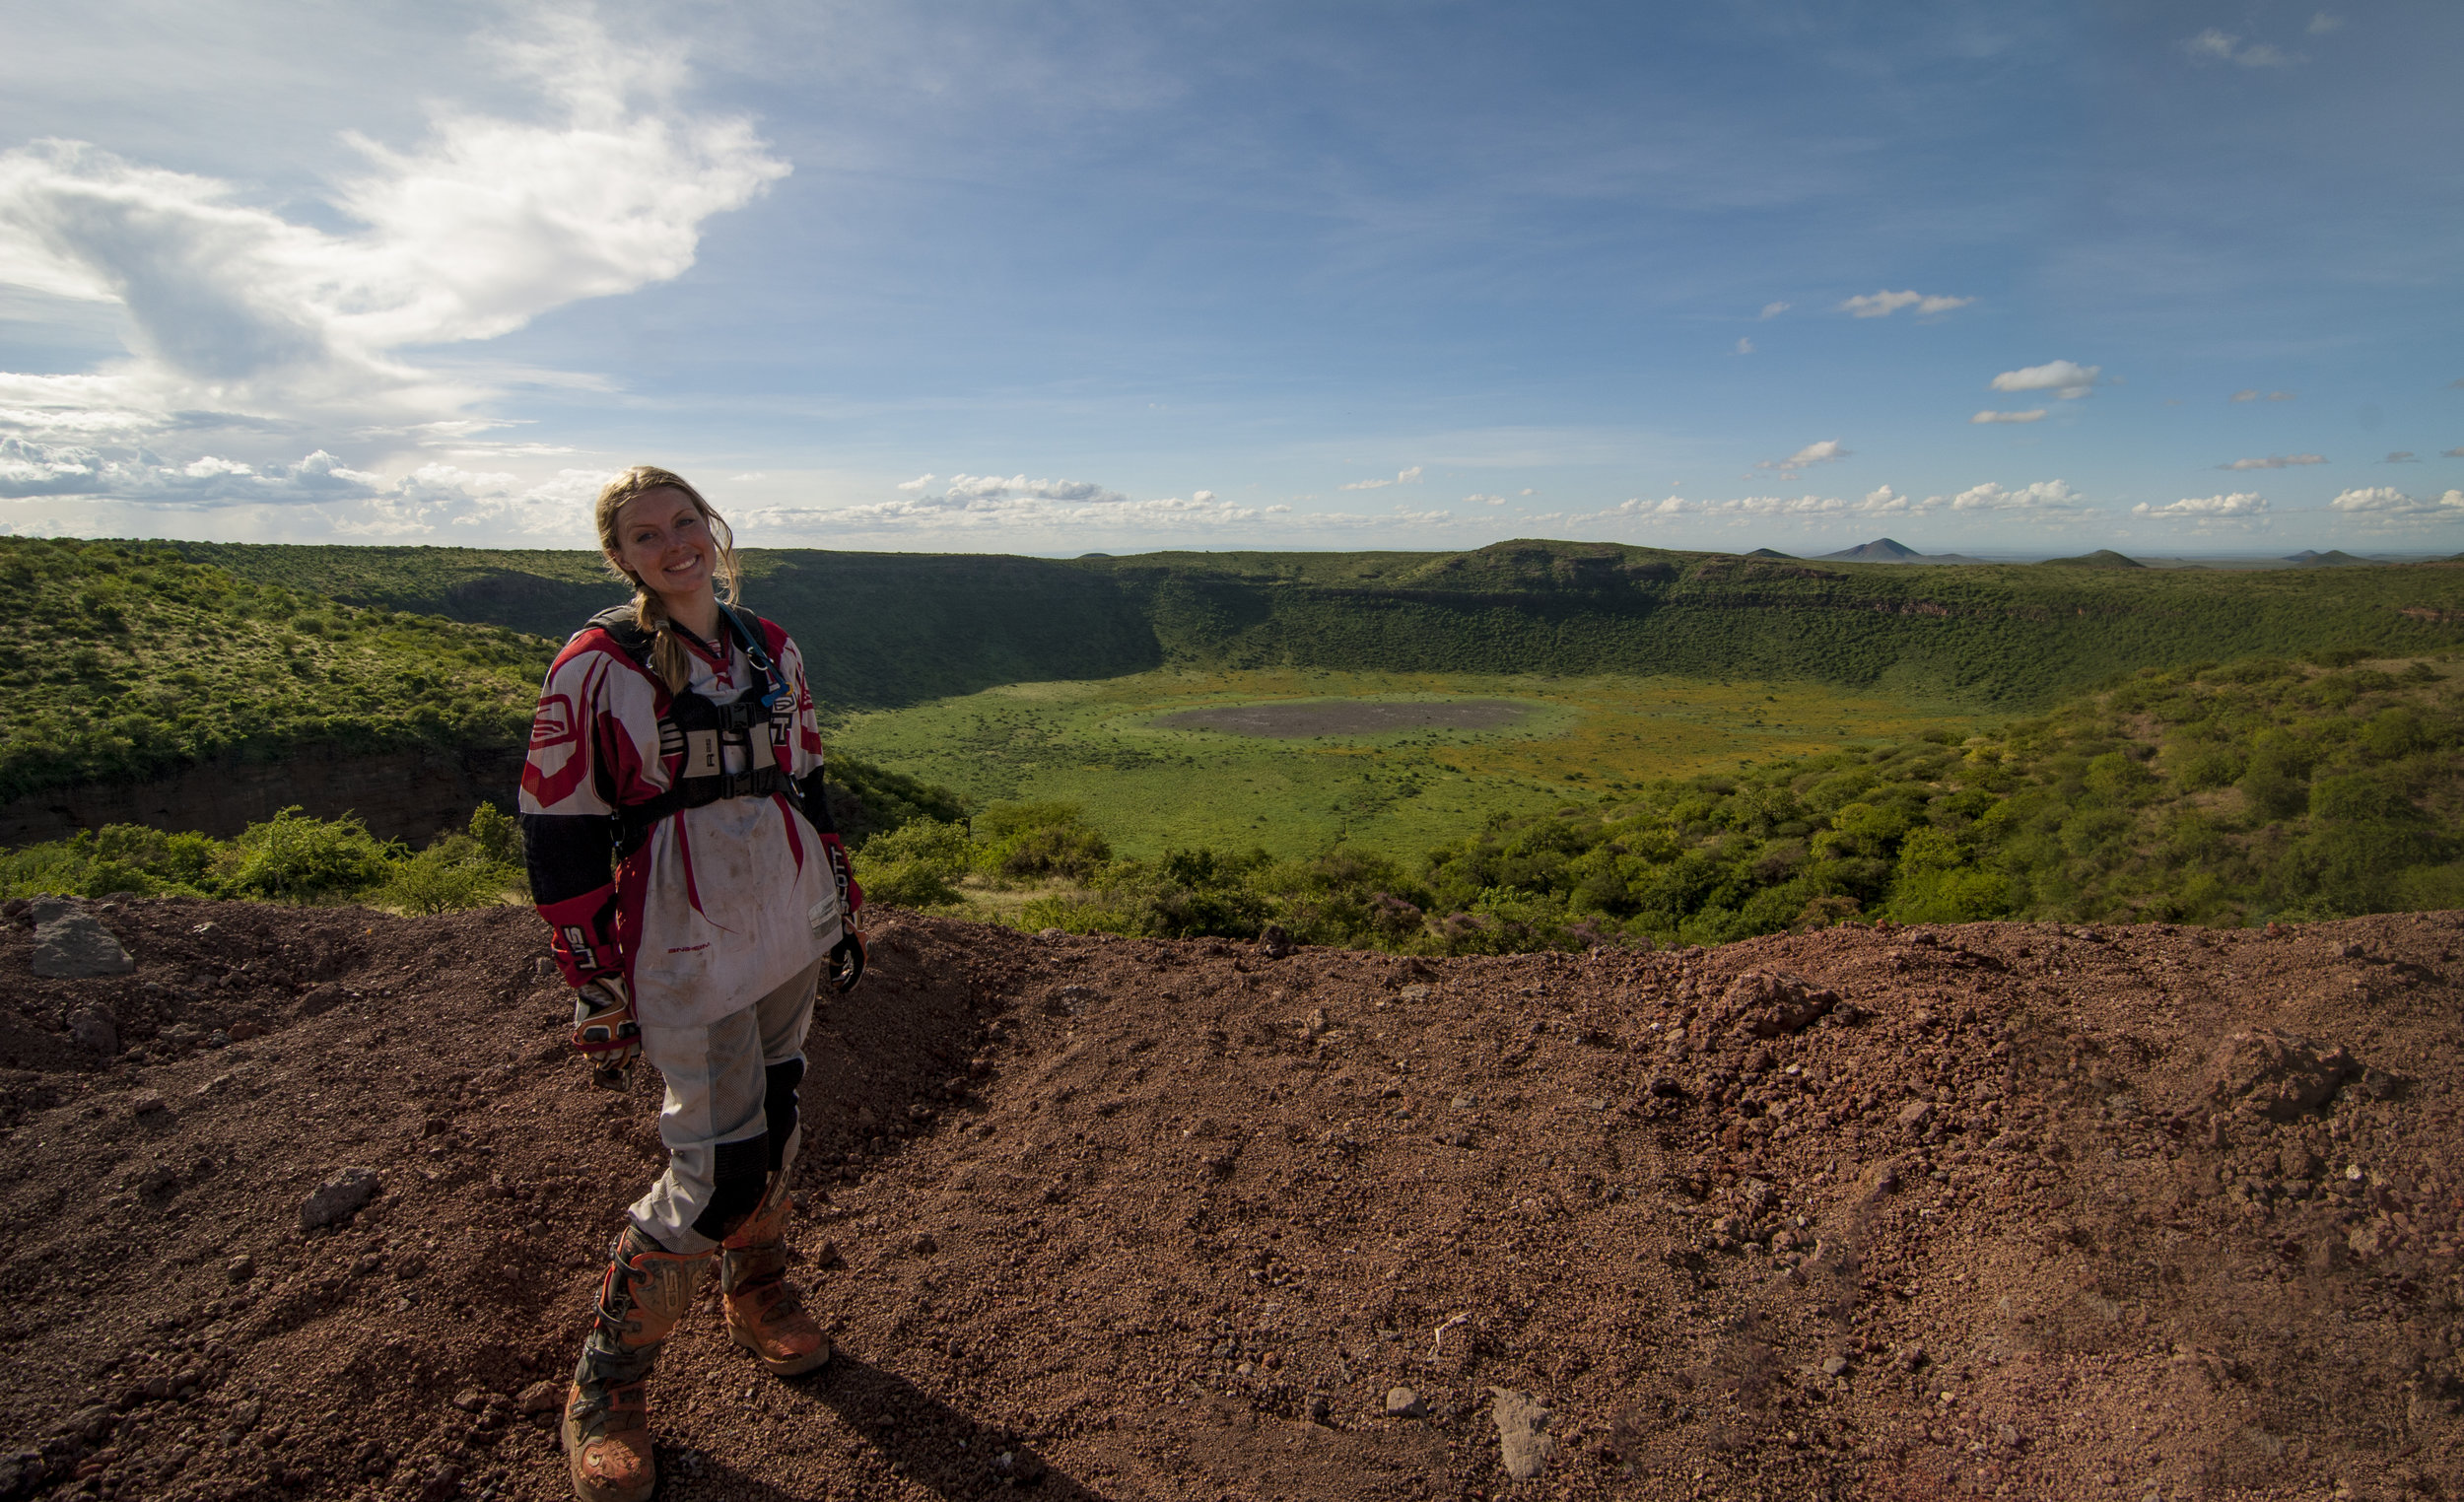 2.KENYA-MoyaleRoad_Crater_CLARE-WOWImages.jpg